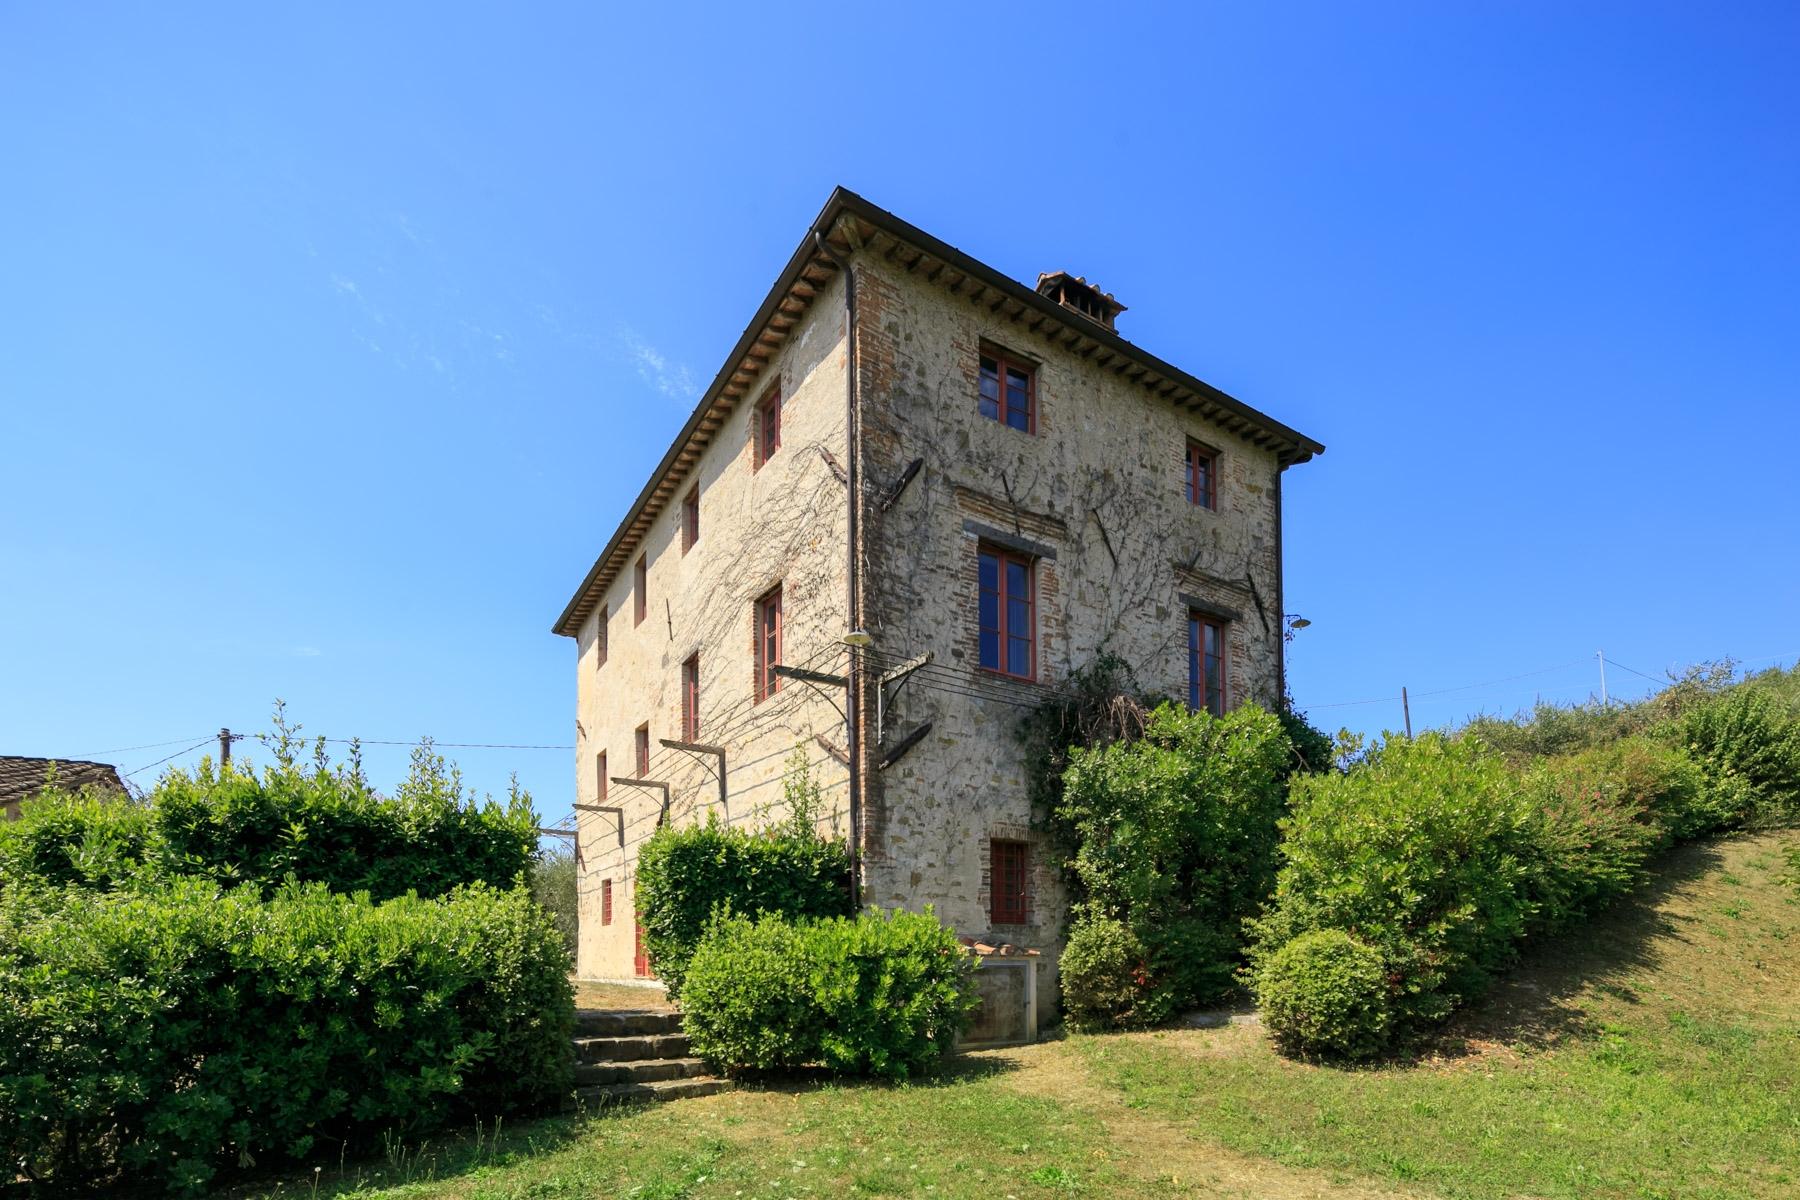 Villa in Vendita a Lucca: 5 locali, 225 mq - Foto 2